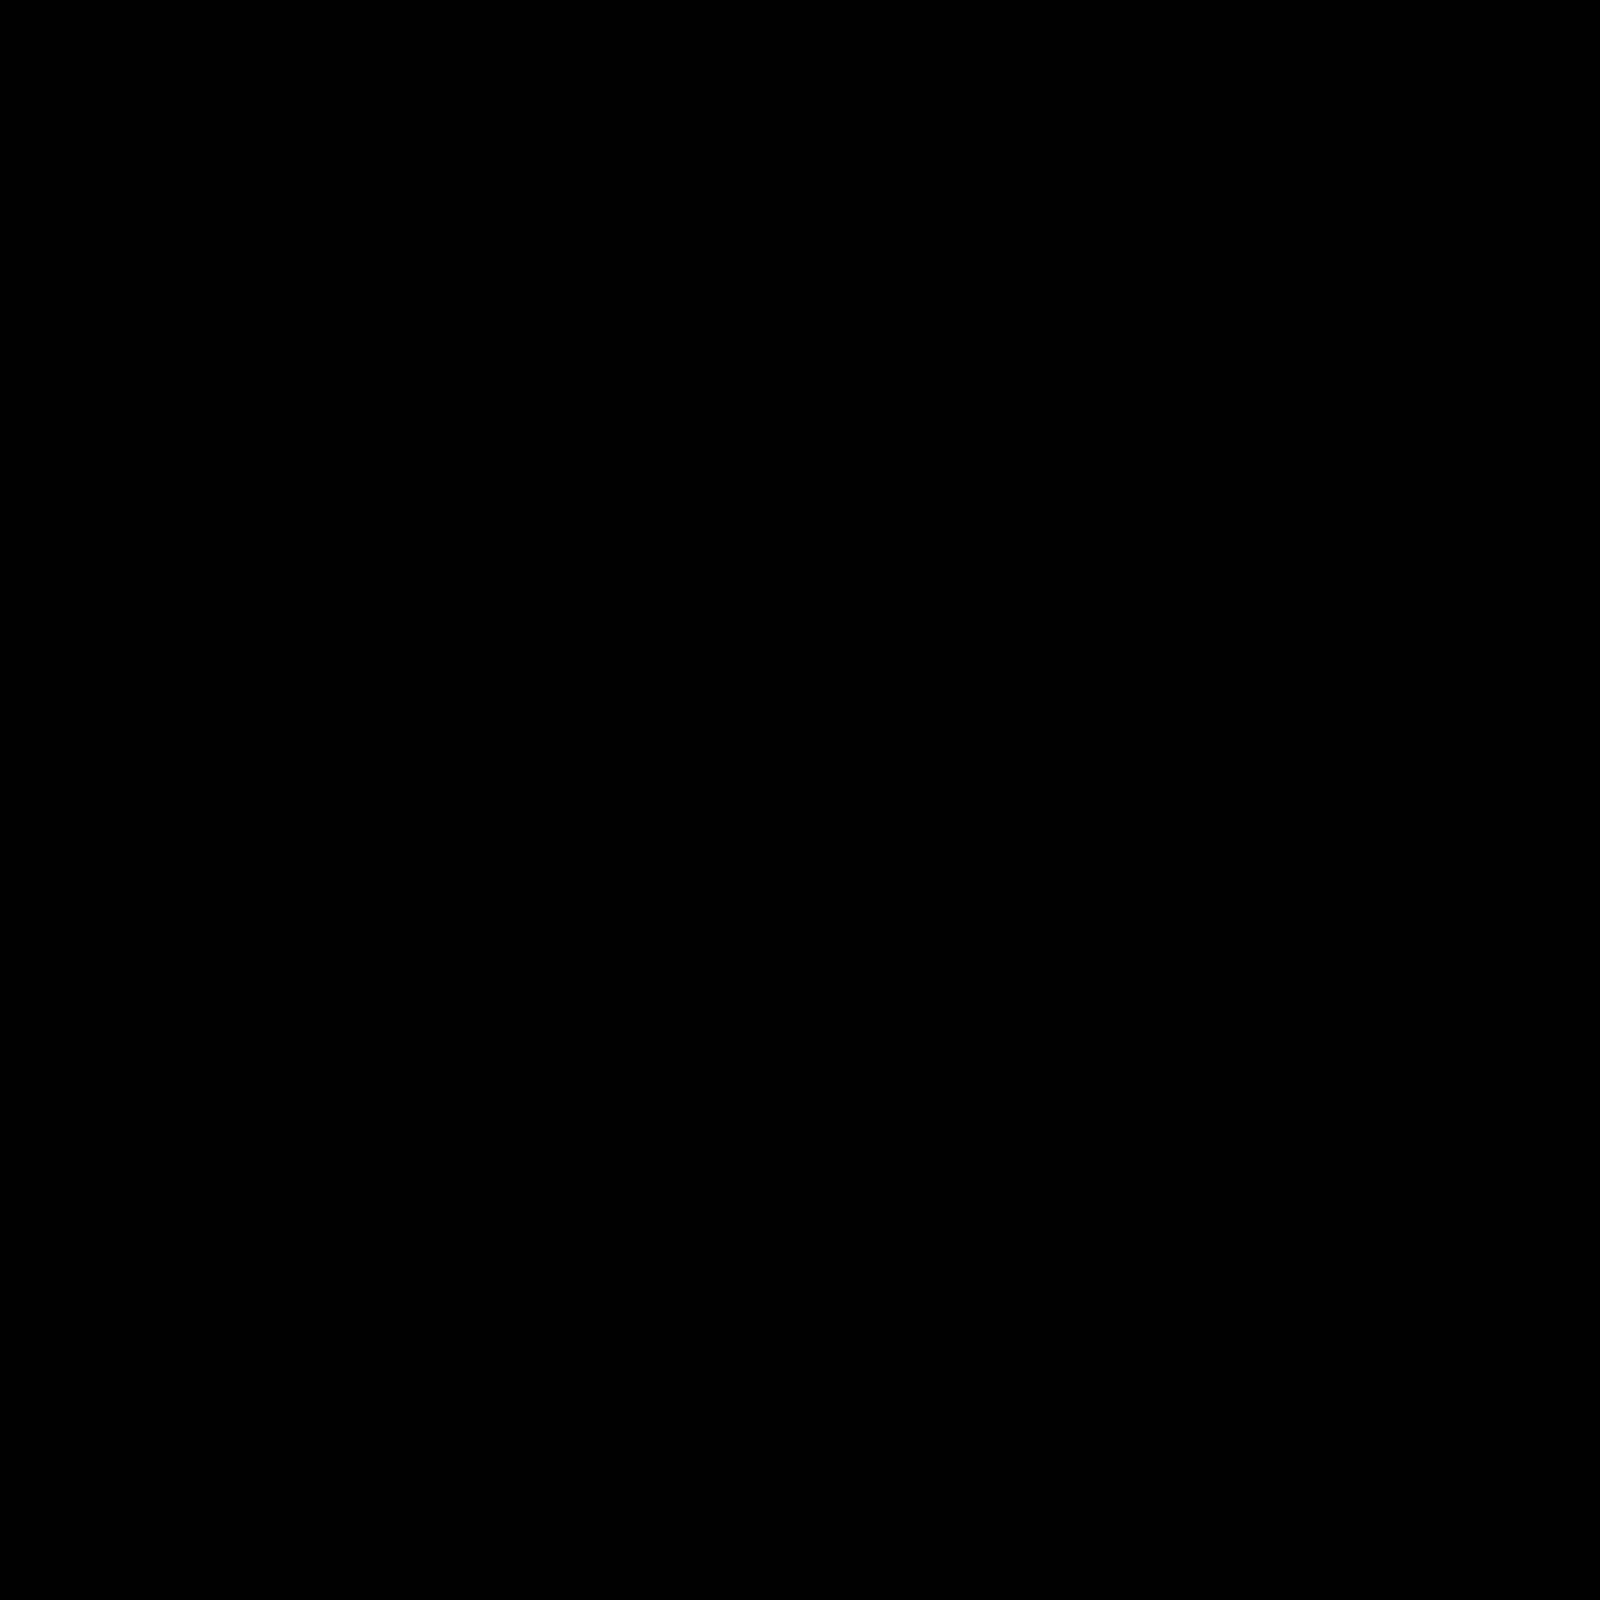 No SIM Card Filled icon